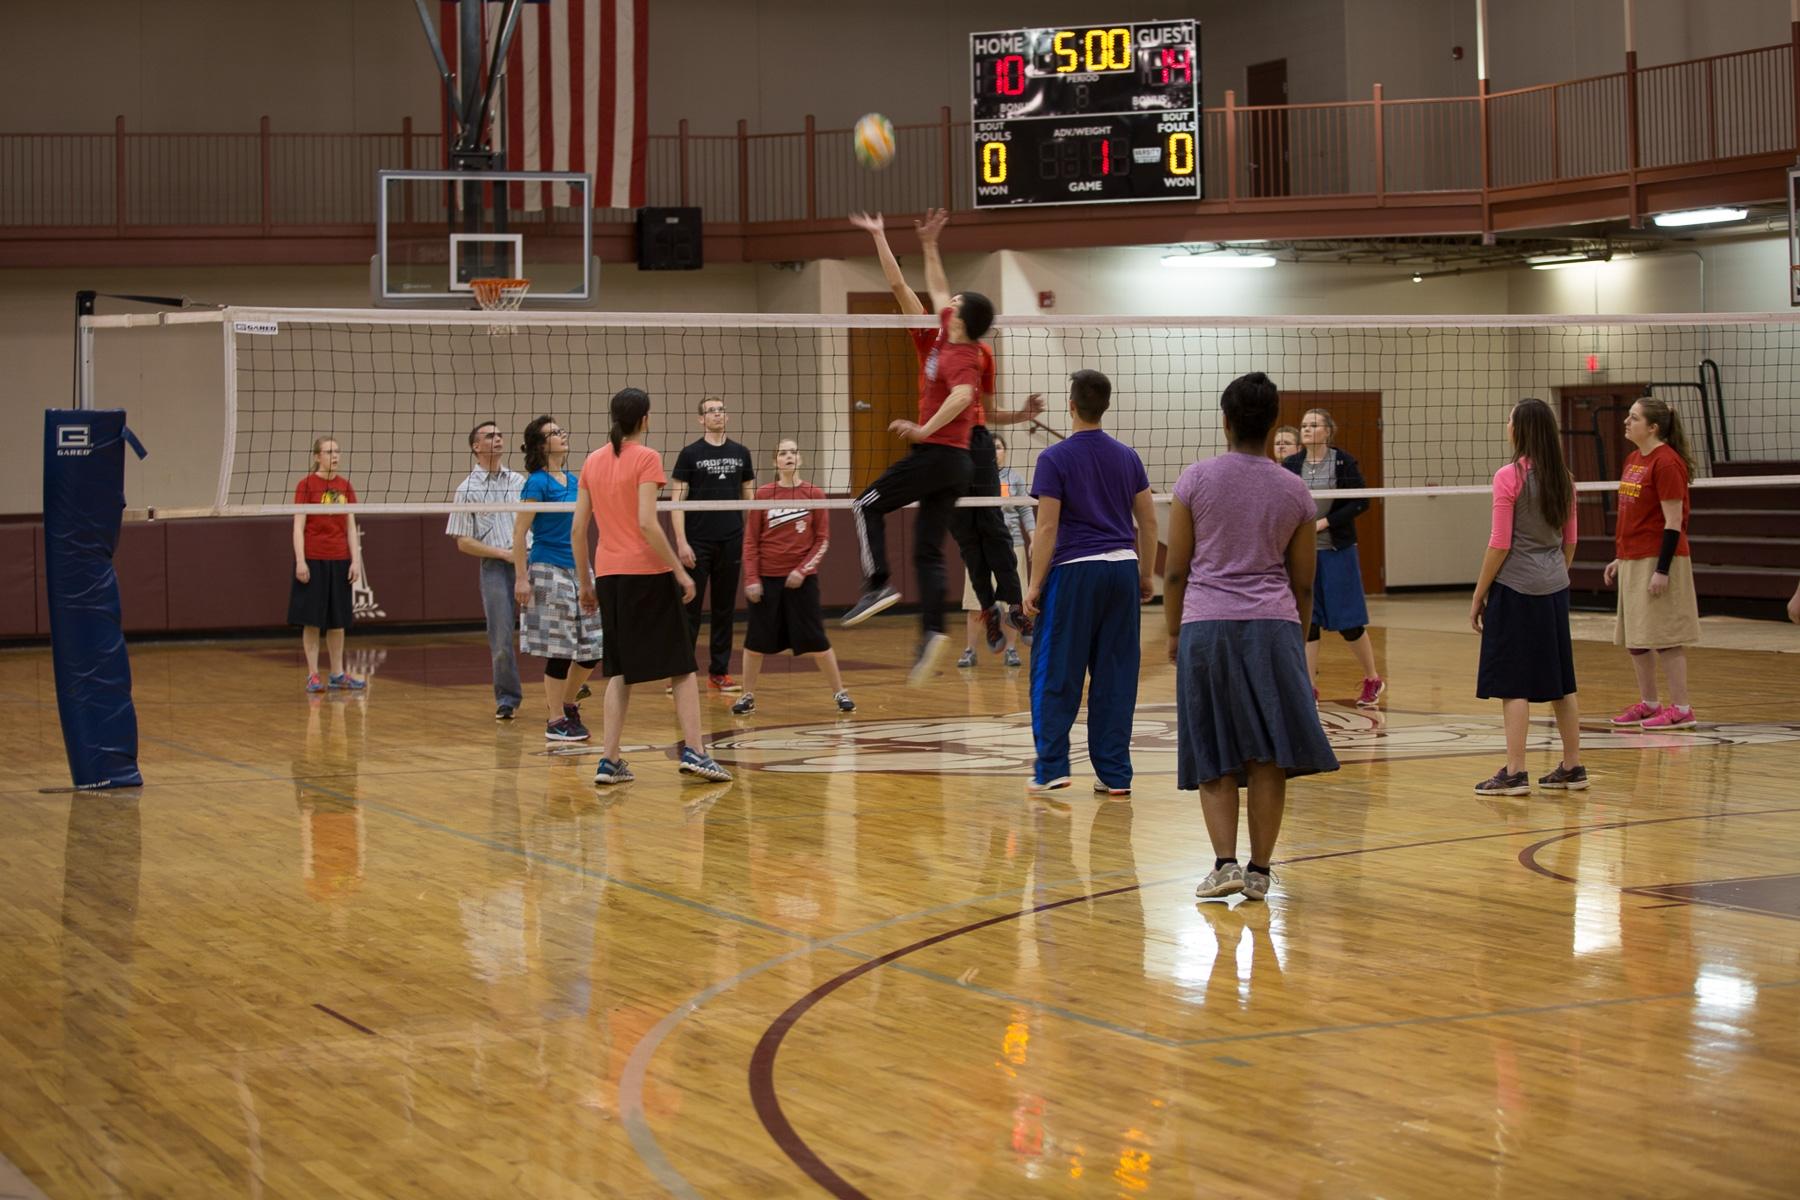 2017 Volleyball Marathon Fairhaven Baptist Church